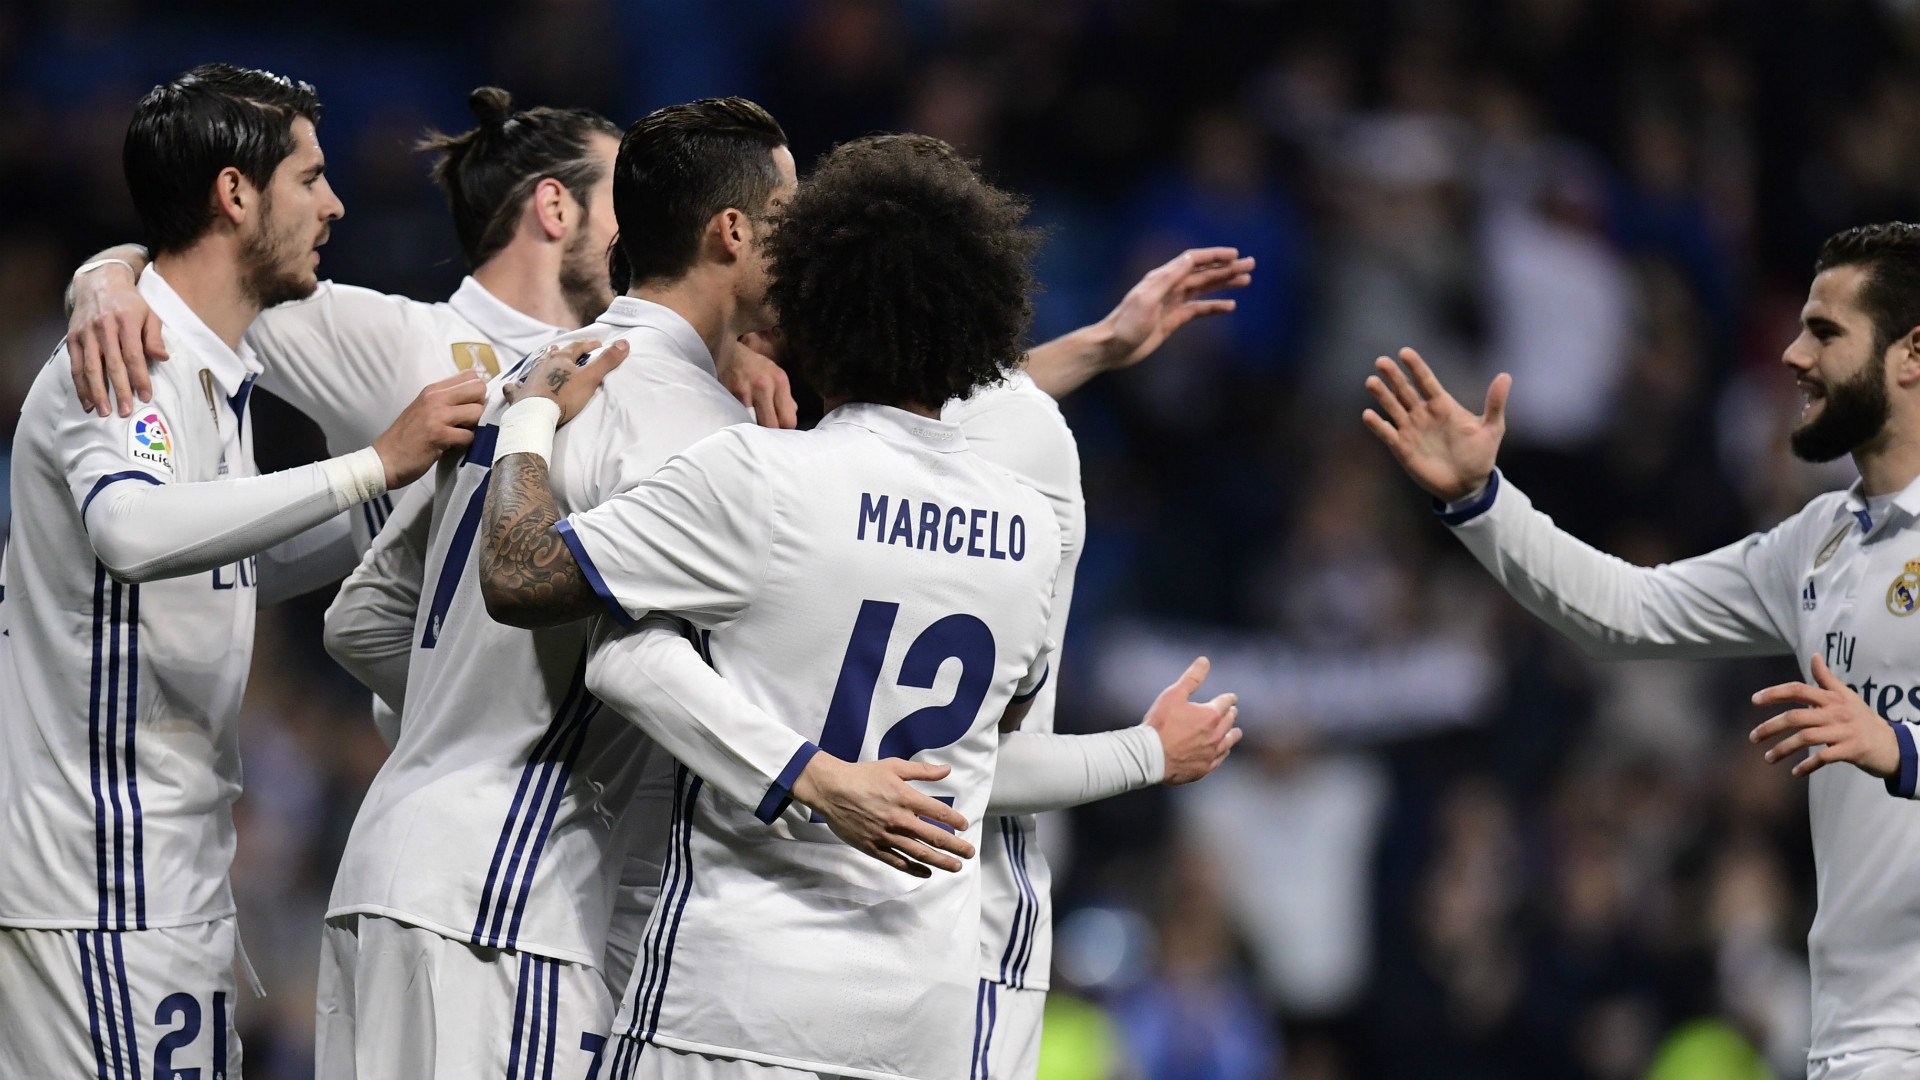 Morata Marcelo Real Madrid Las Palmas LaLiga